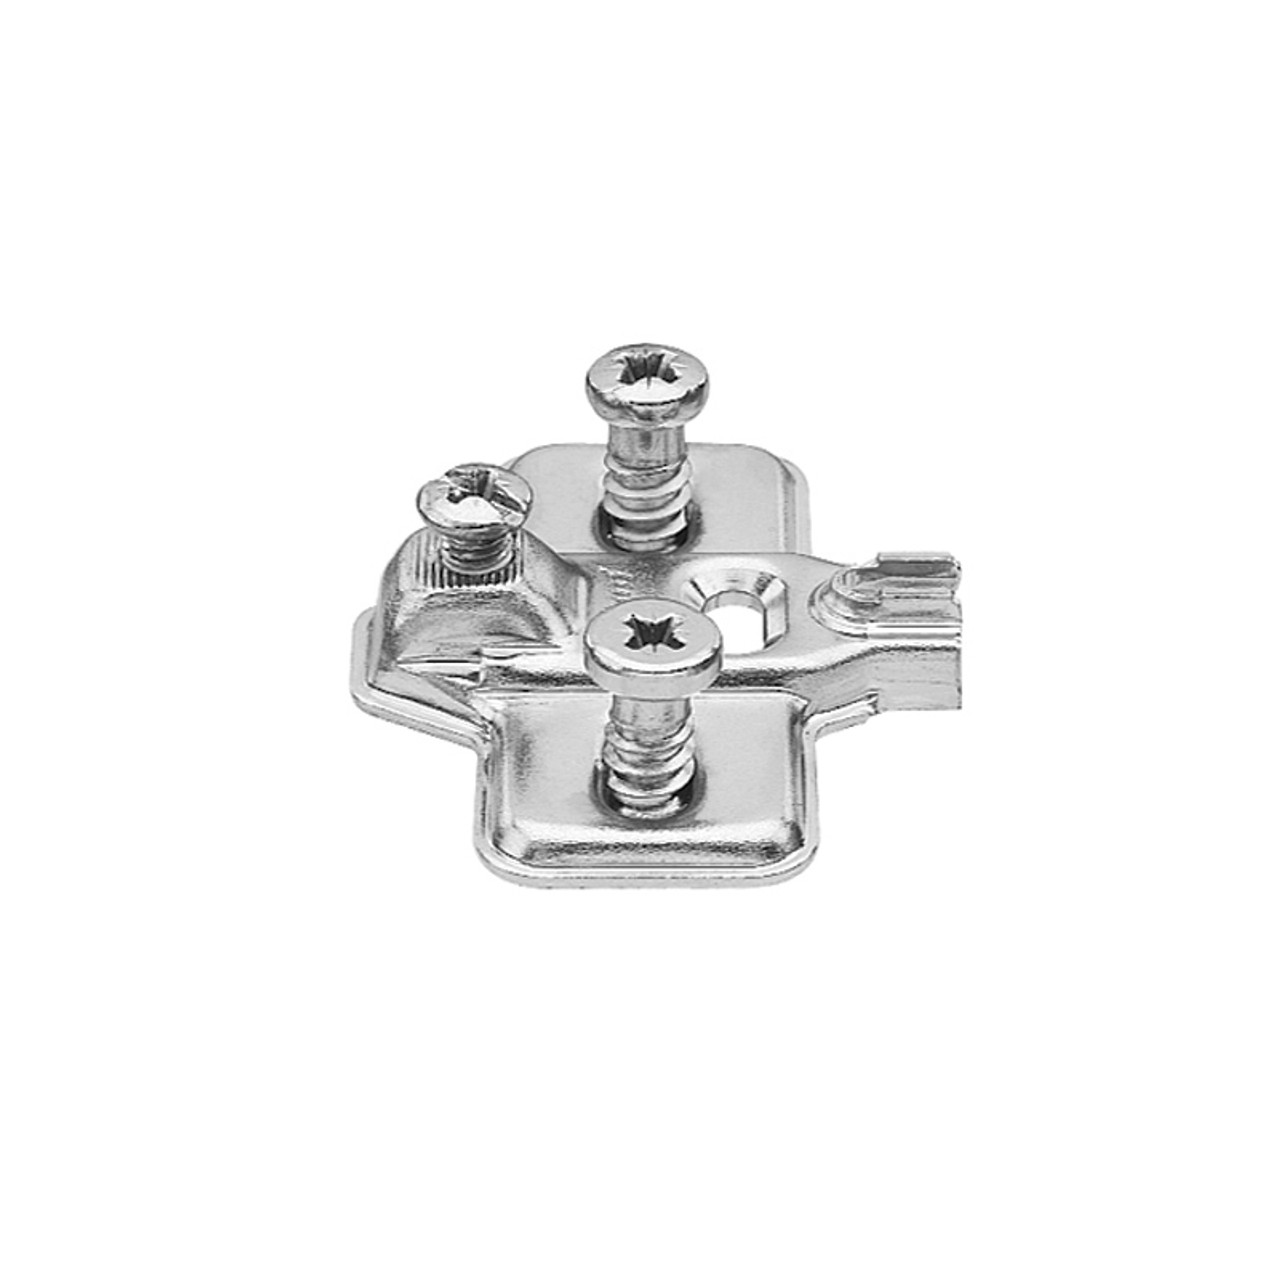 193L8100 MODUL Cruciform Mounting Plate   0mm